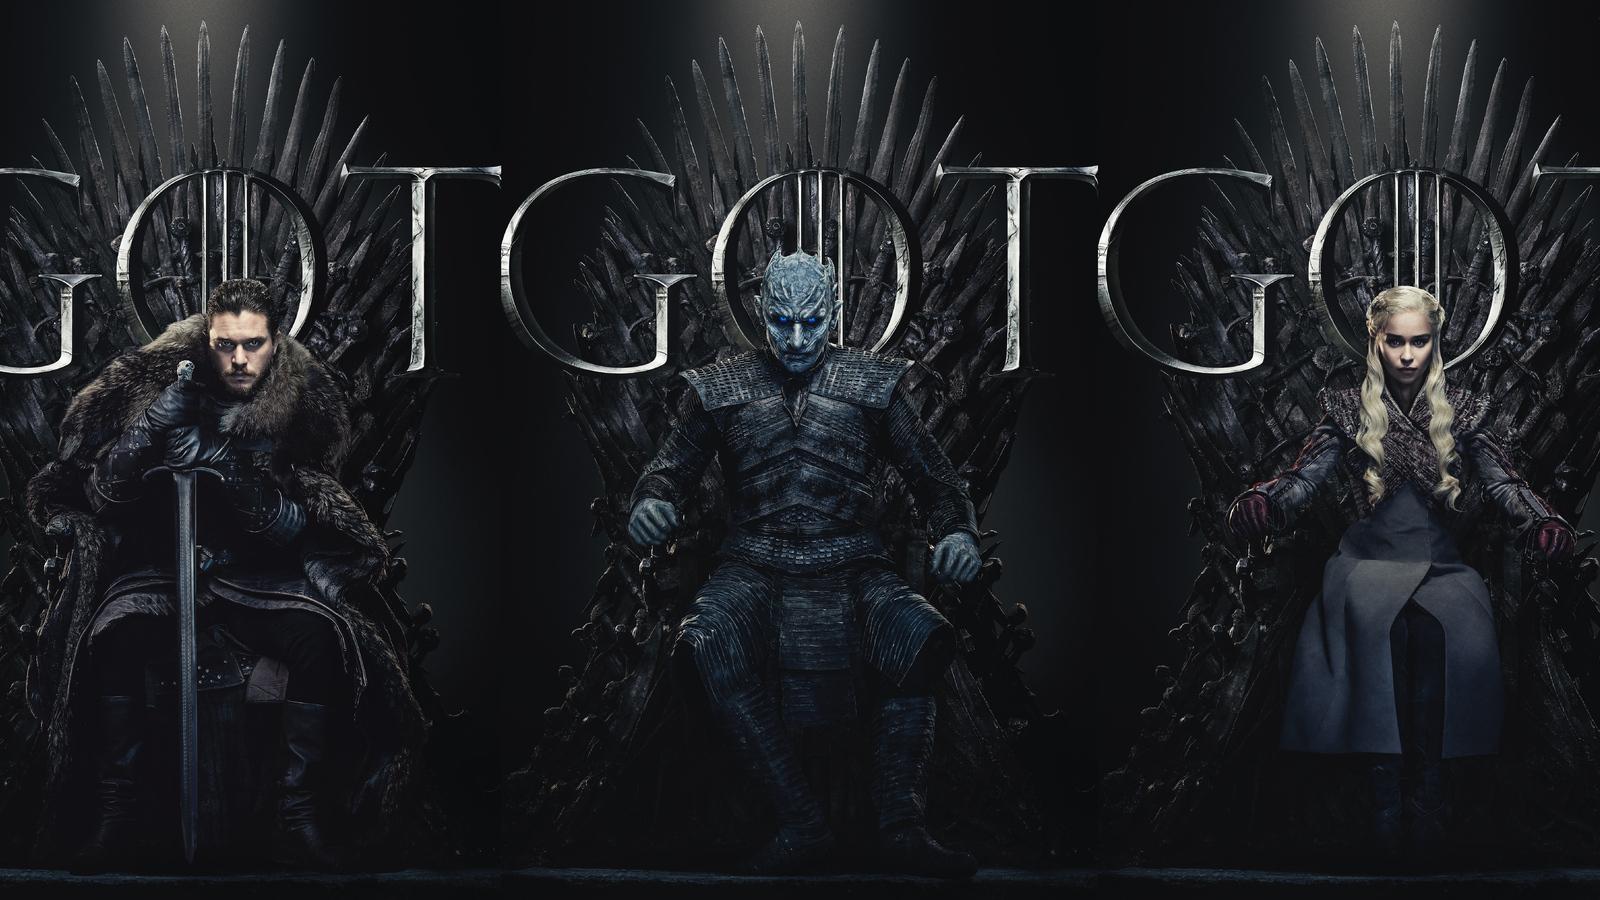 1600x900 Game Of Thrones Season 8 Poster 2019 1600x900 ...